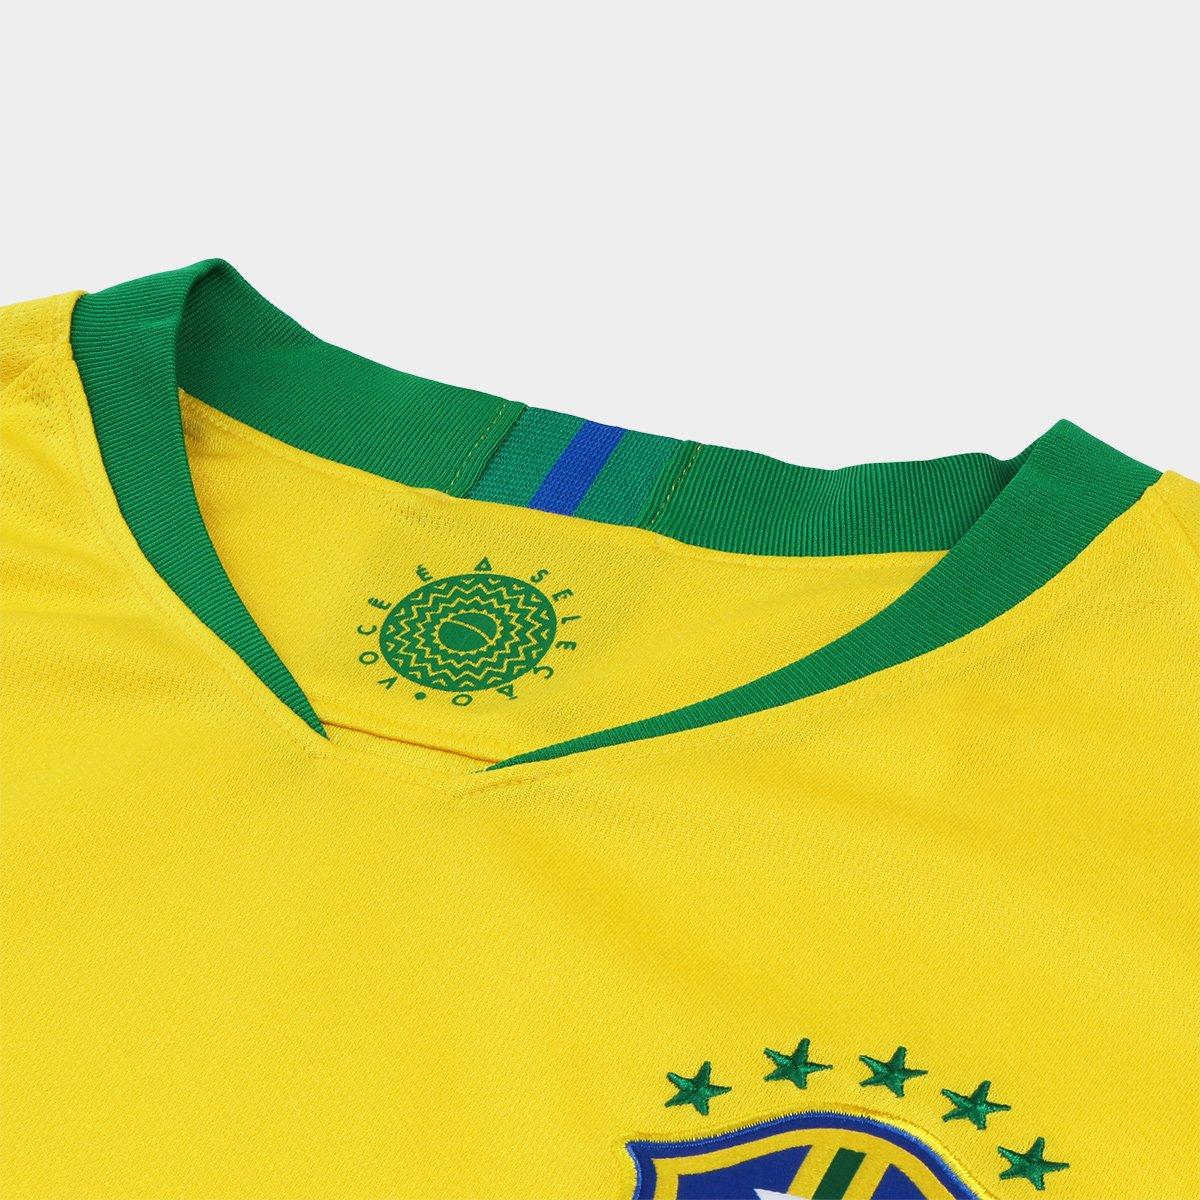 Camisa Seleção Brasil I 2018 nº 12 Marcelo Torcedor Nike b7d1c845159b7